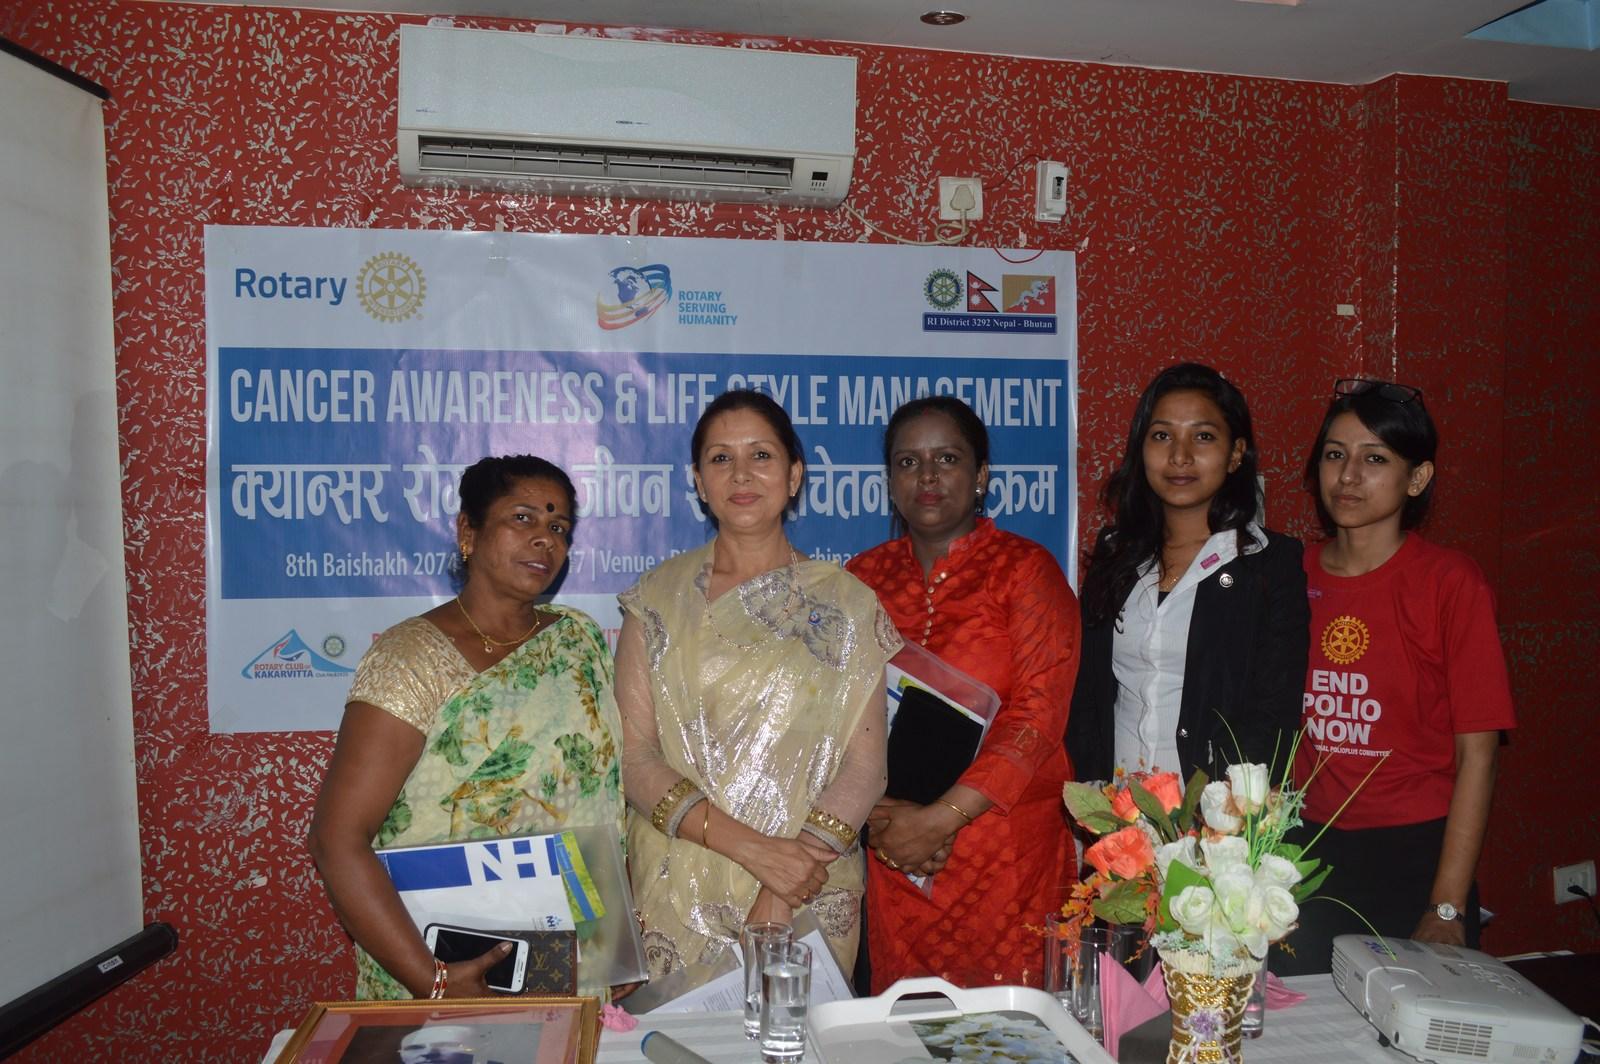 Cancer-Awareness-Life-Style-Management-Interaction-Program-2016-17-Rotary-Club-of-Kakarvitta-113